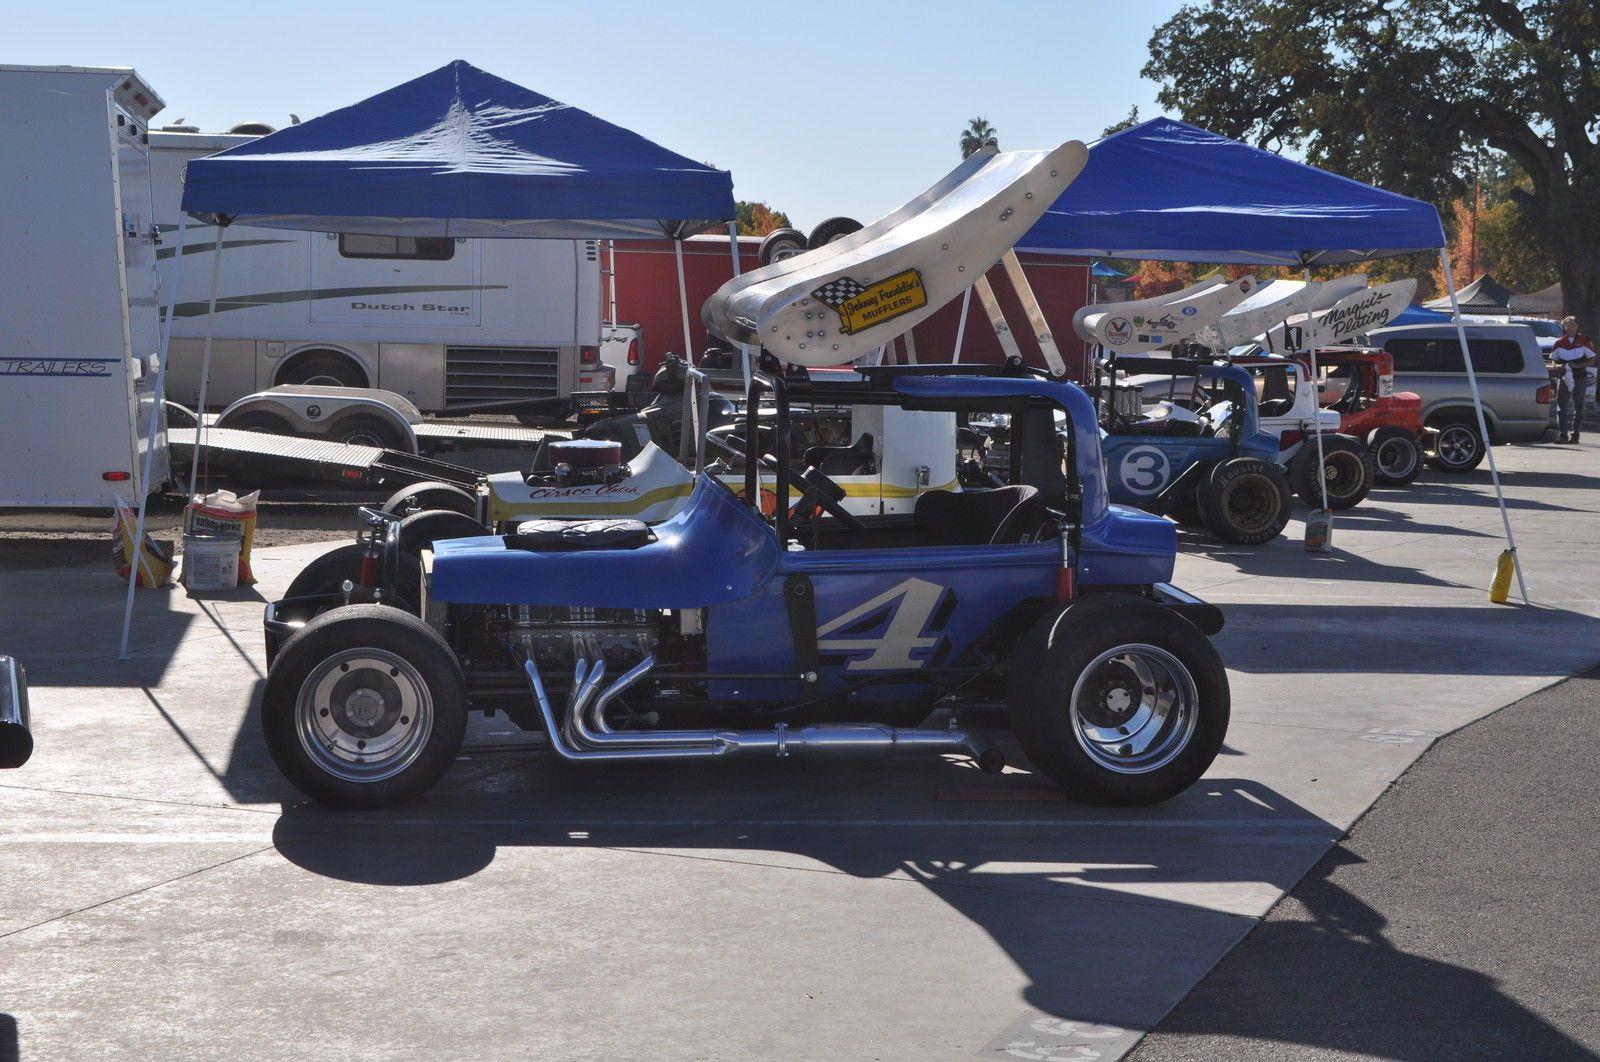 60s Vintage Super Modified Racing | Race cars for sale | Pinterest ...